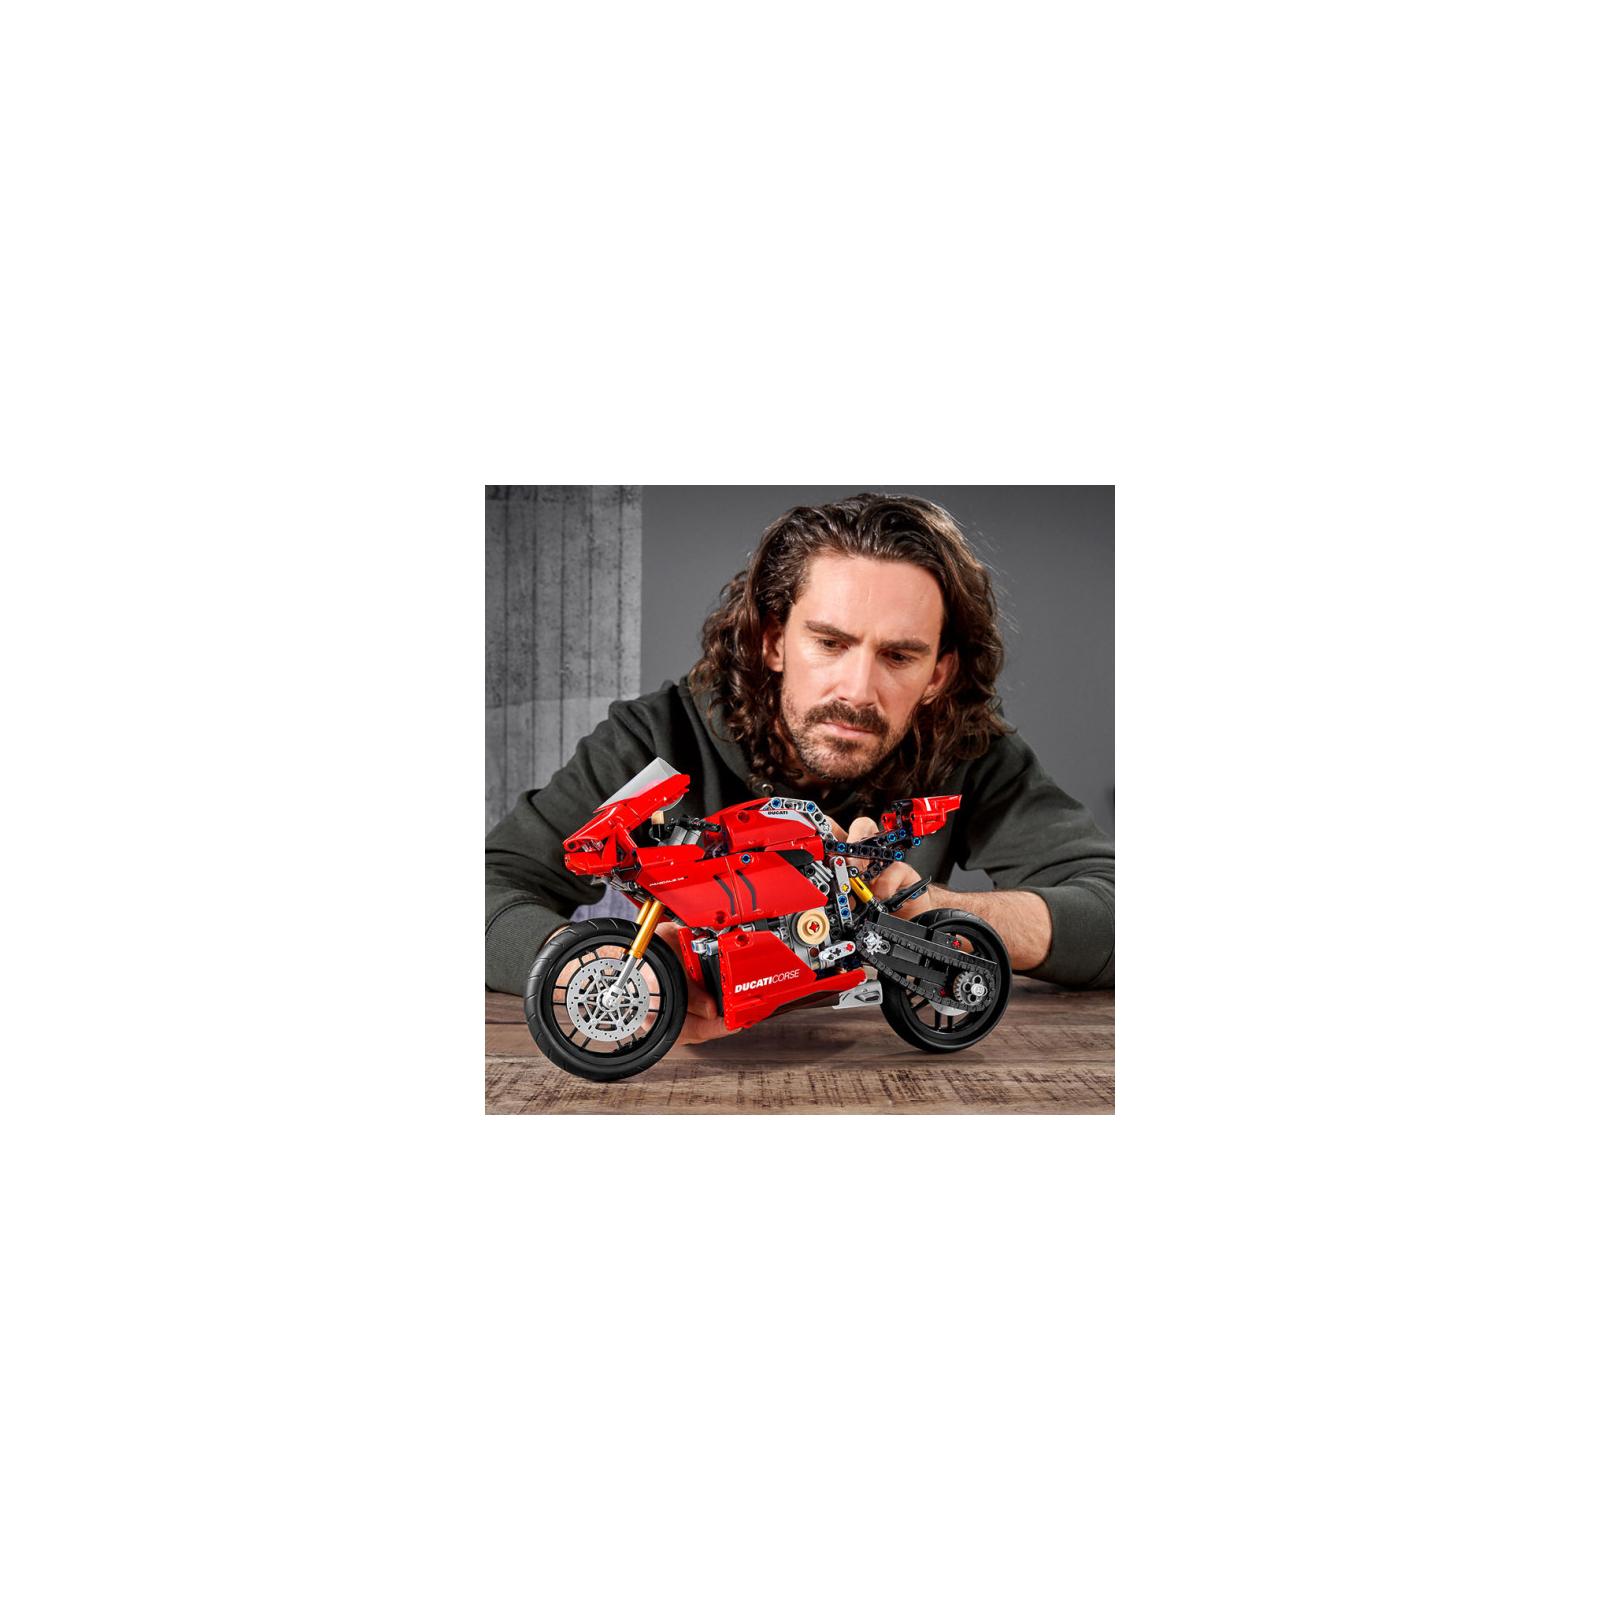 Конструктор LEGO Technic Ducati Panigale V4 R 0 646 детали (42107) изображение 6